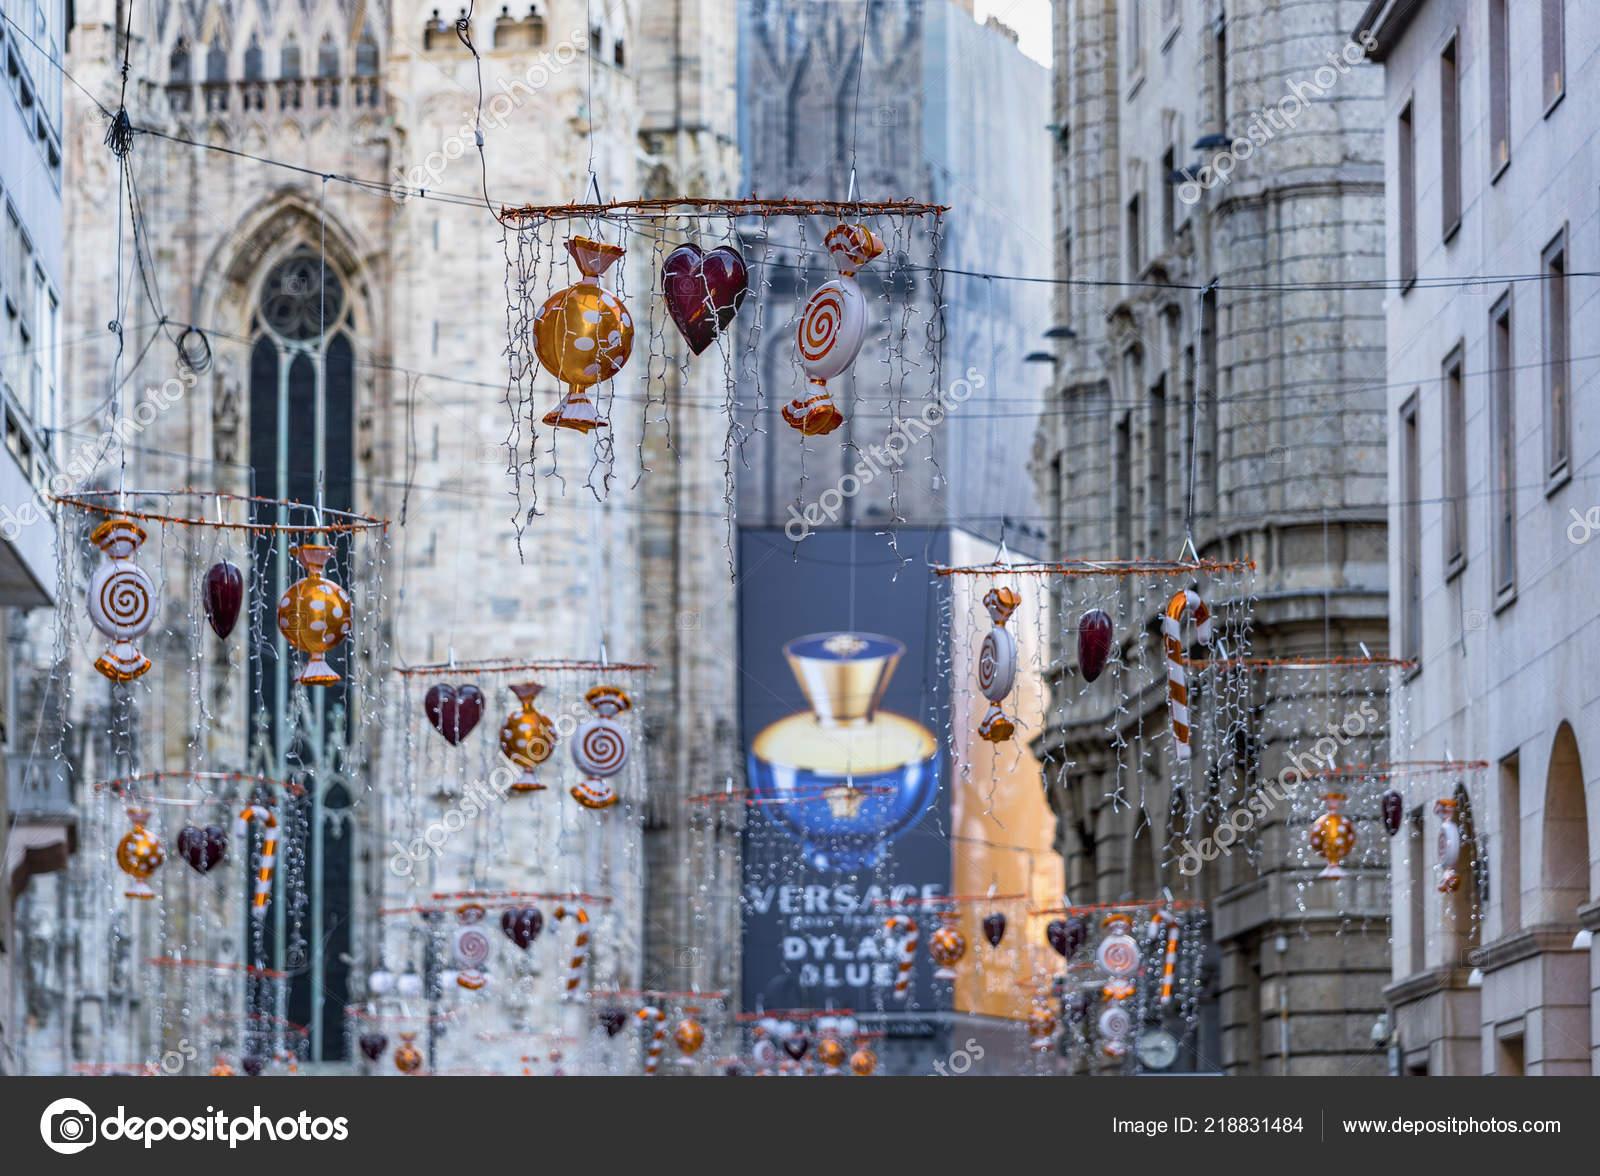 Milan Italy December 2017 Street Christmas Decorations City